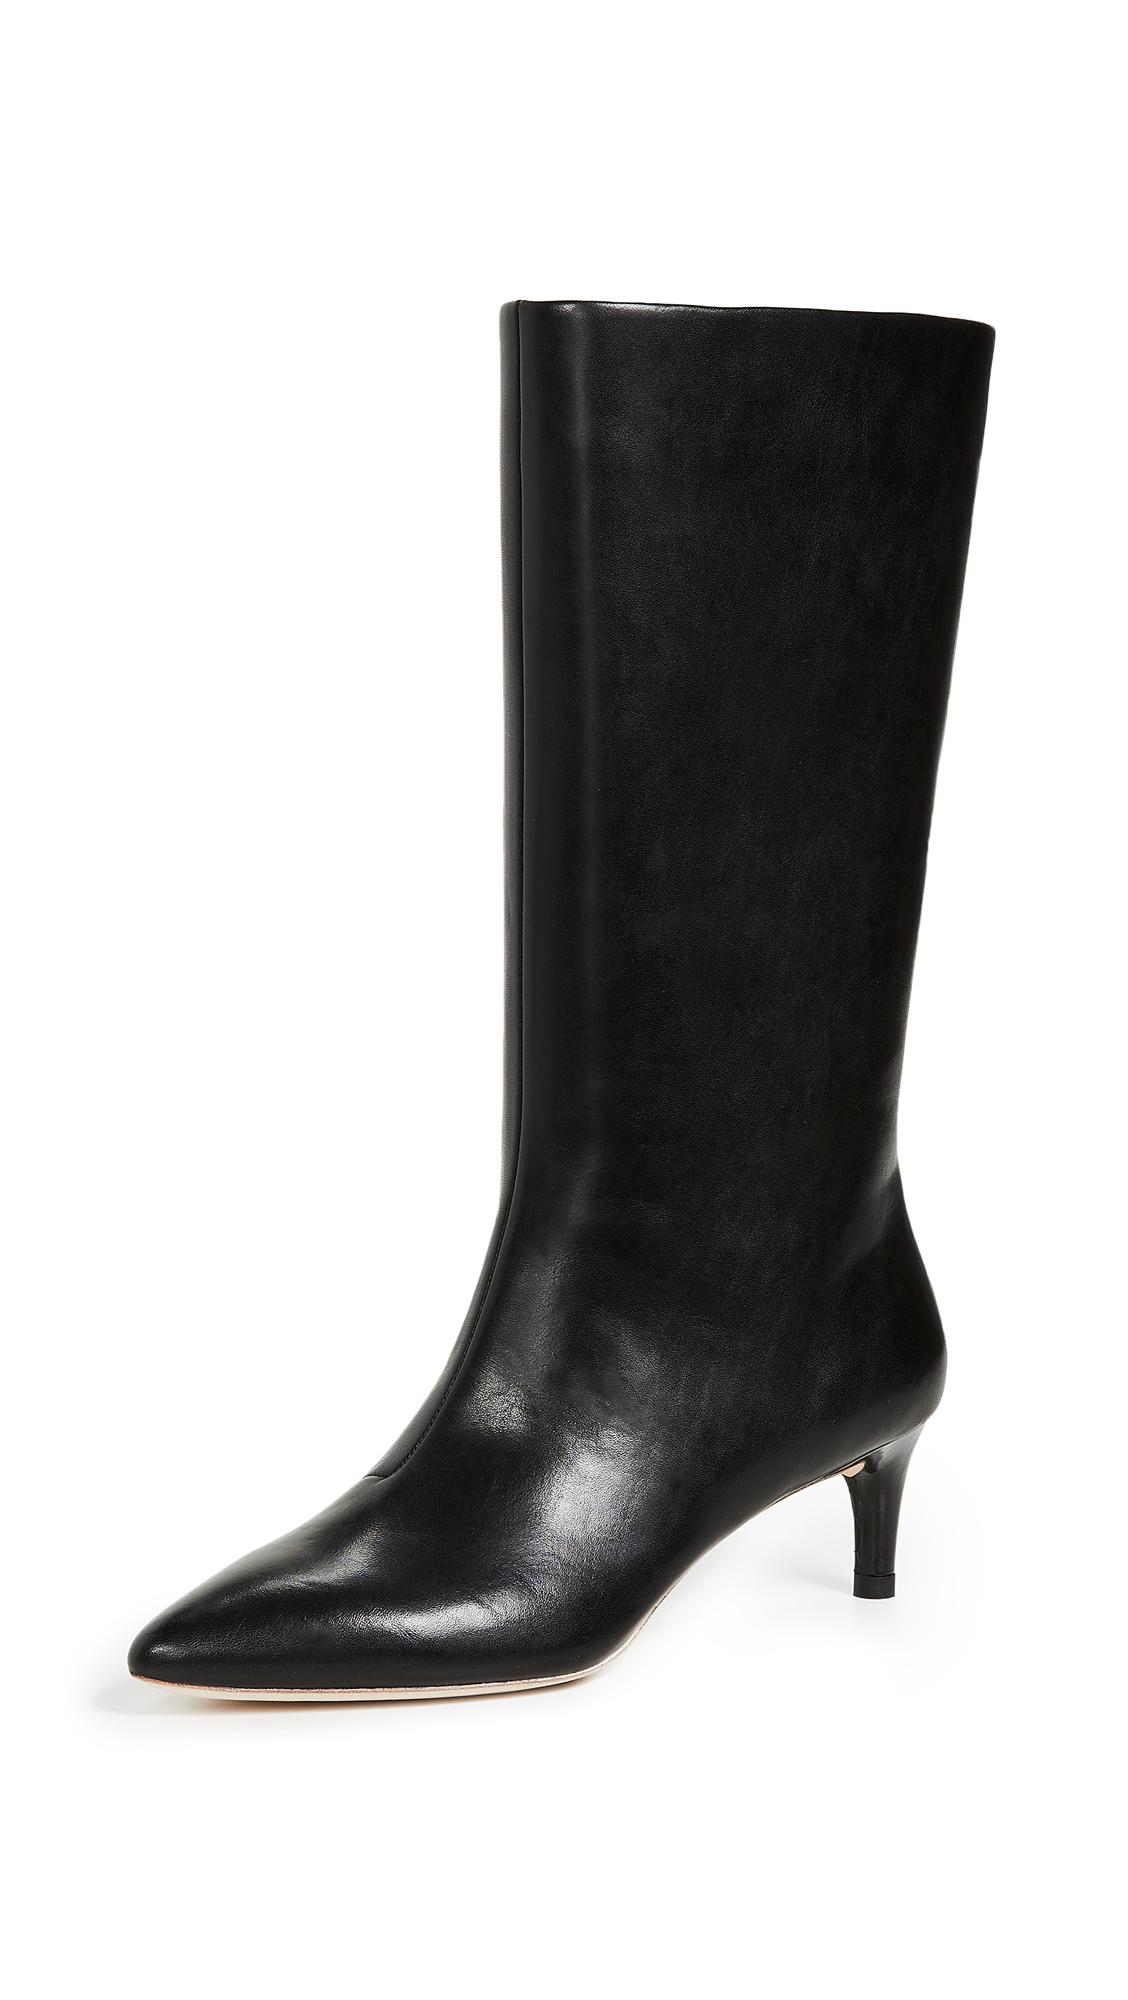 Loeffler Randall Naomi Kitten Heel Tall Boots - Black